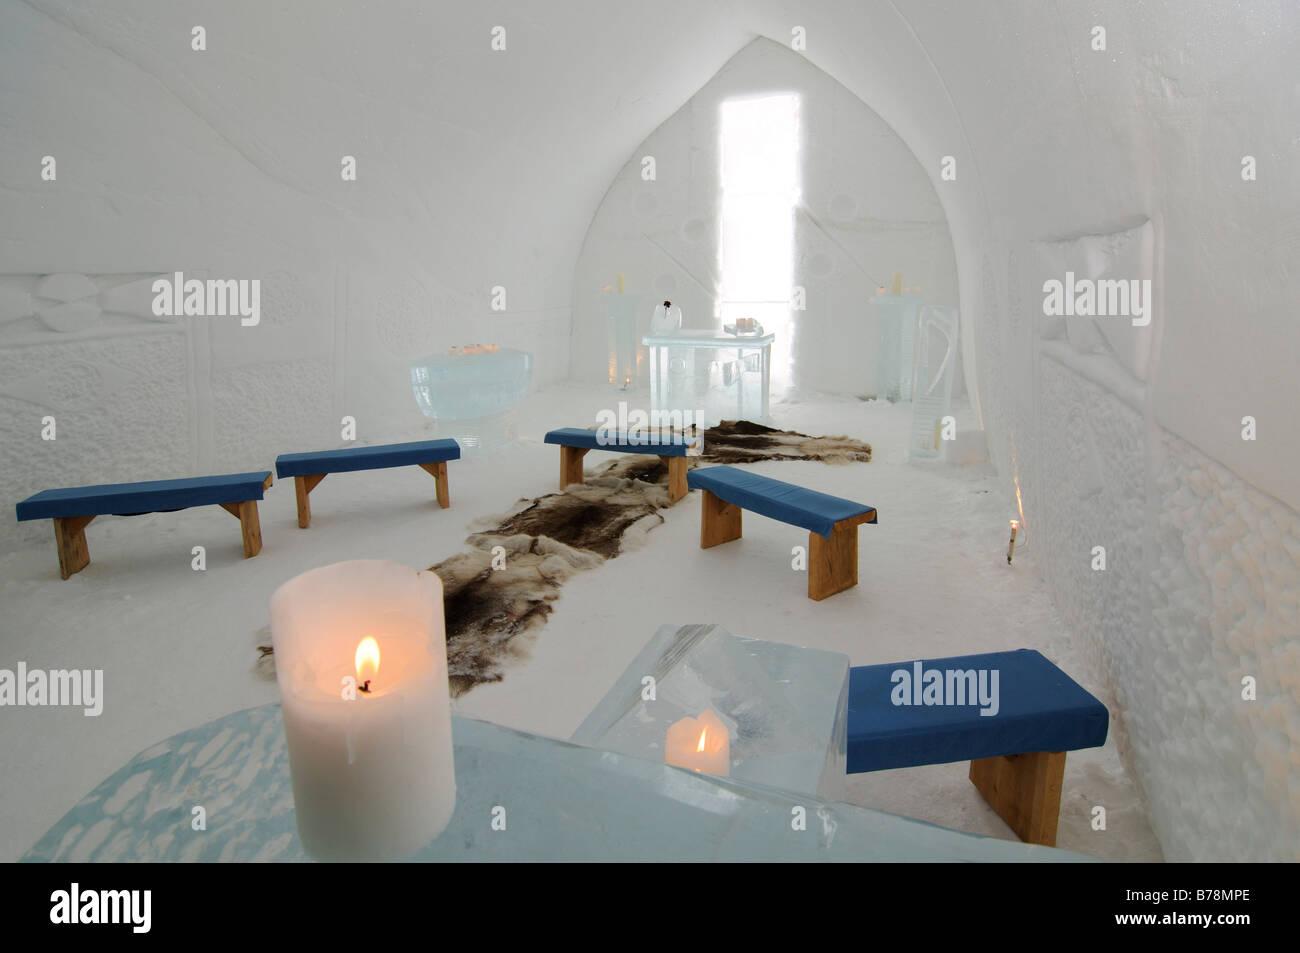 Igloo church, Icehotel Kakslauttanen, Ivalo, Lapland, Finland, Europe Stock Photo